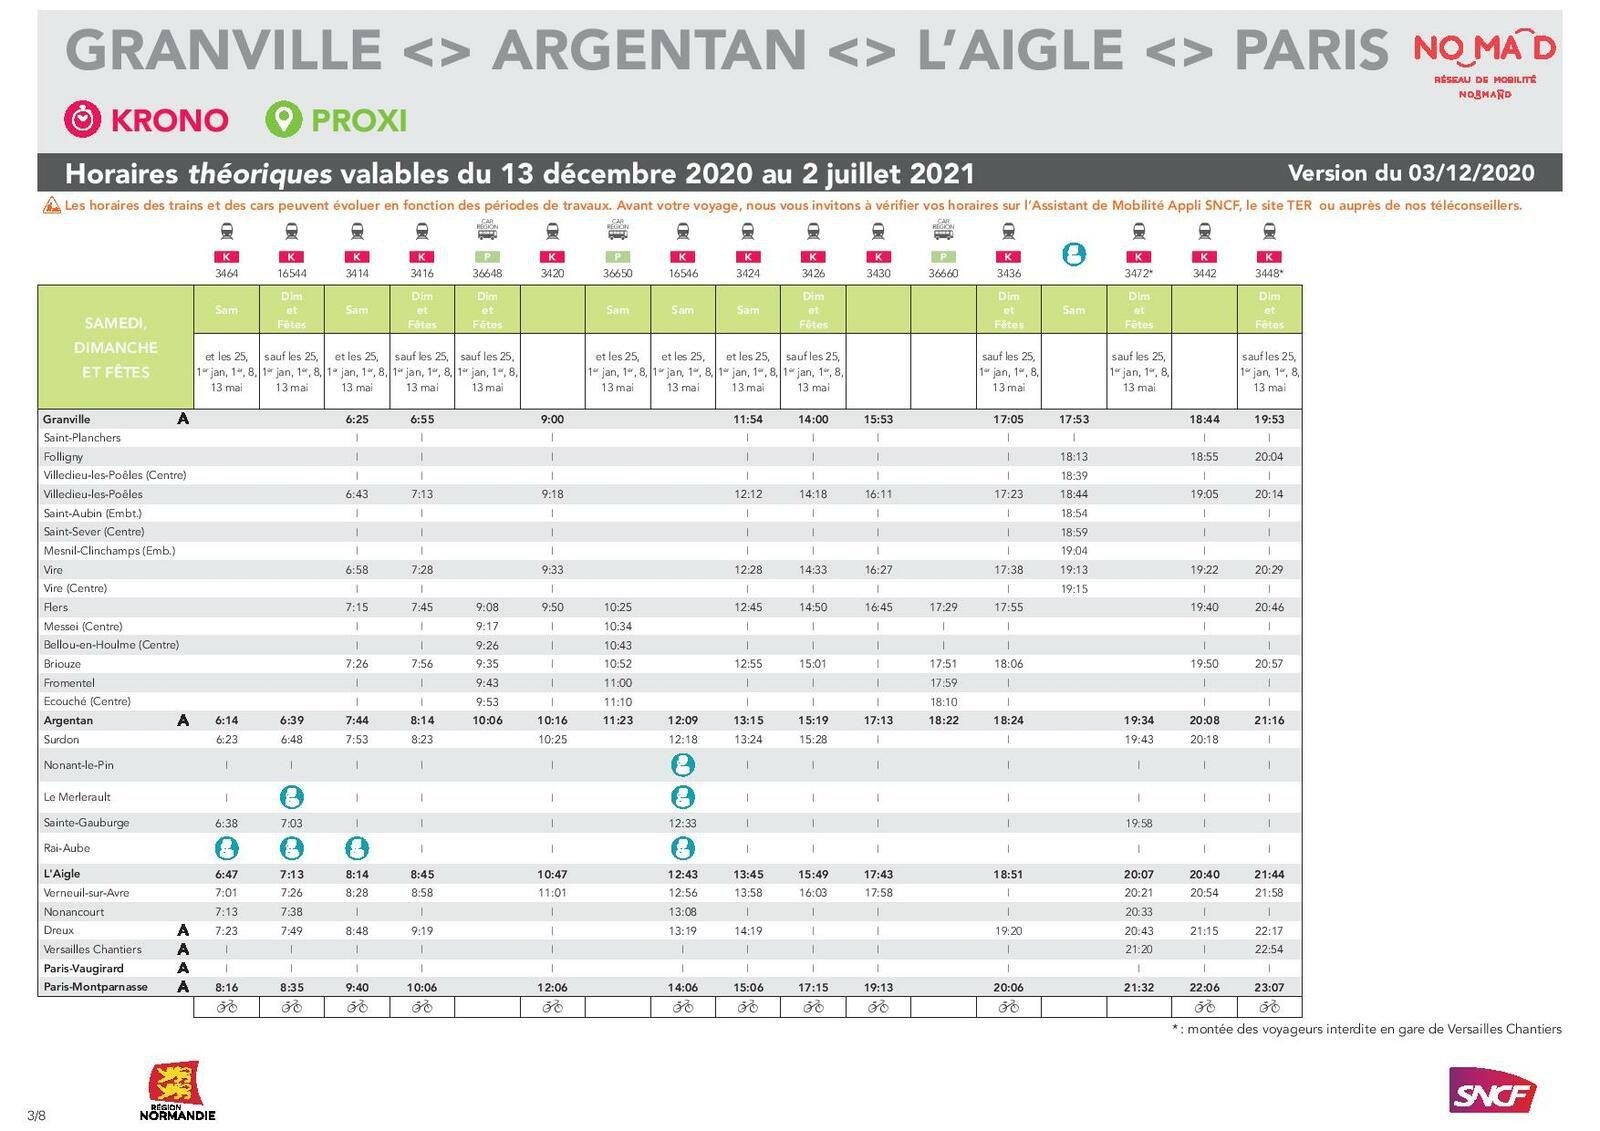 Granville > Paris